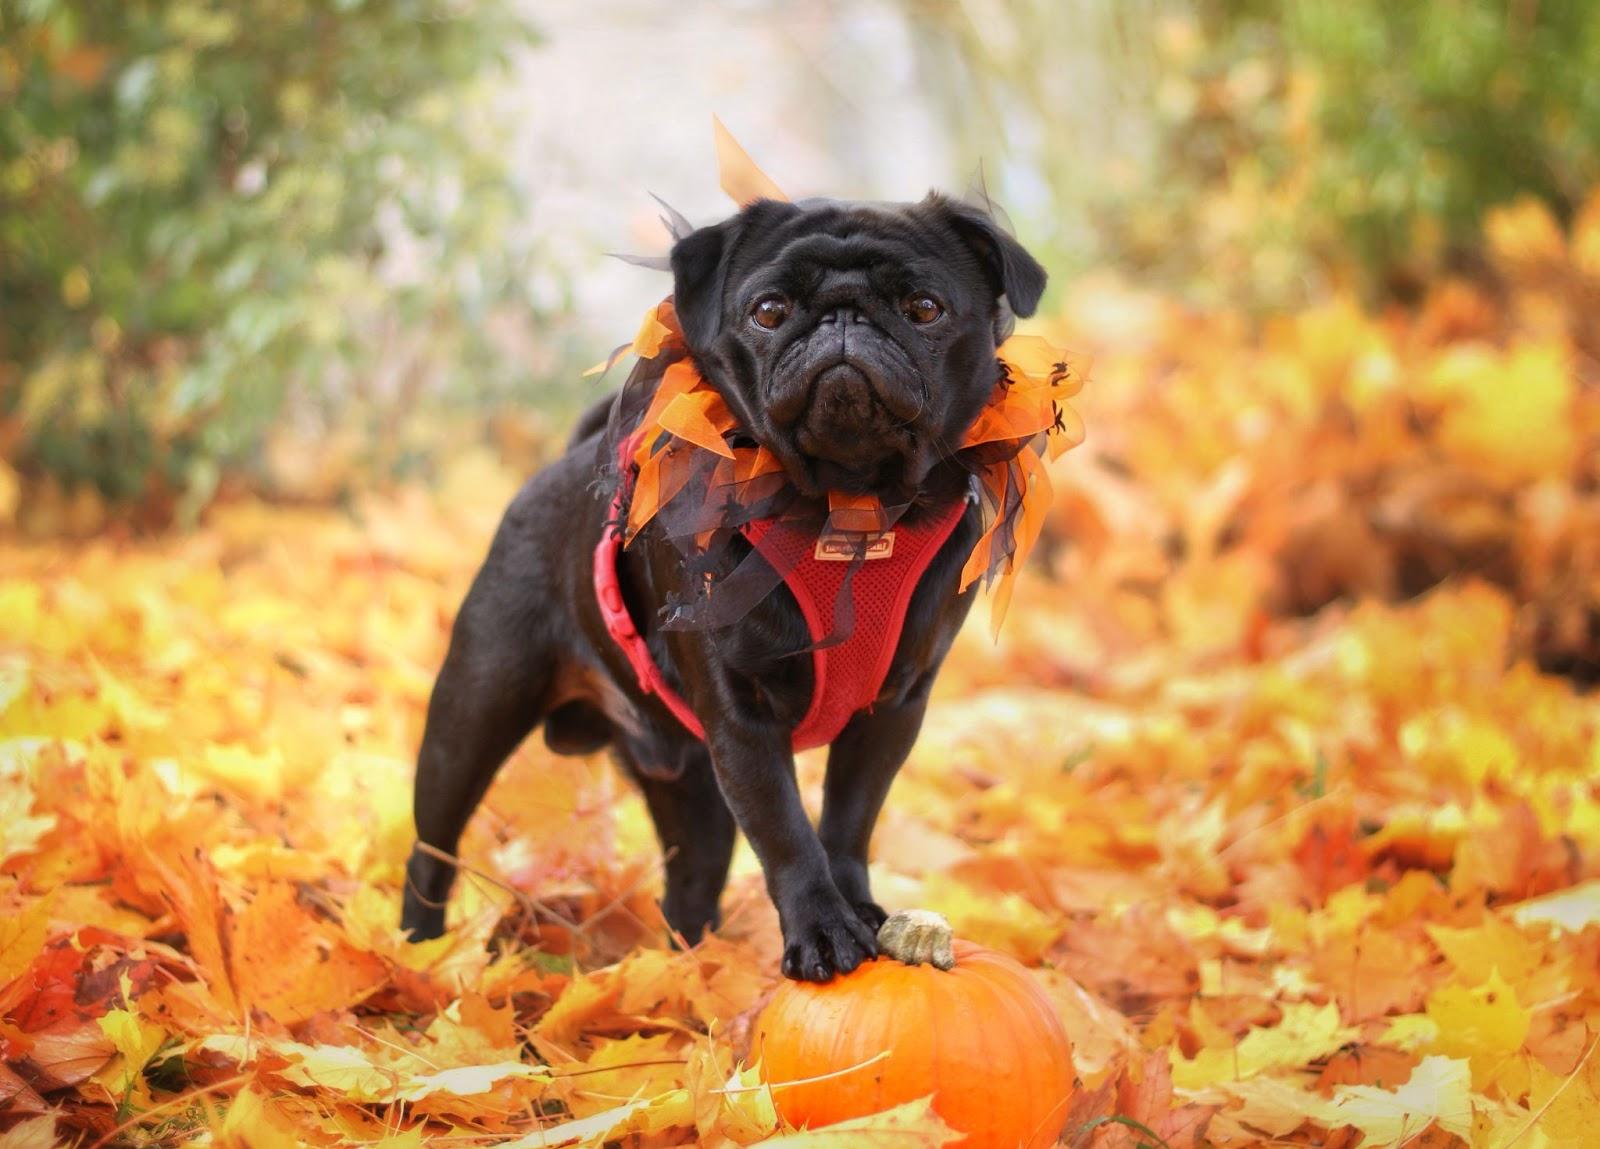 black pug standing on a pumpkin in fall foliage